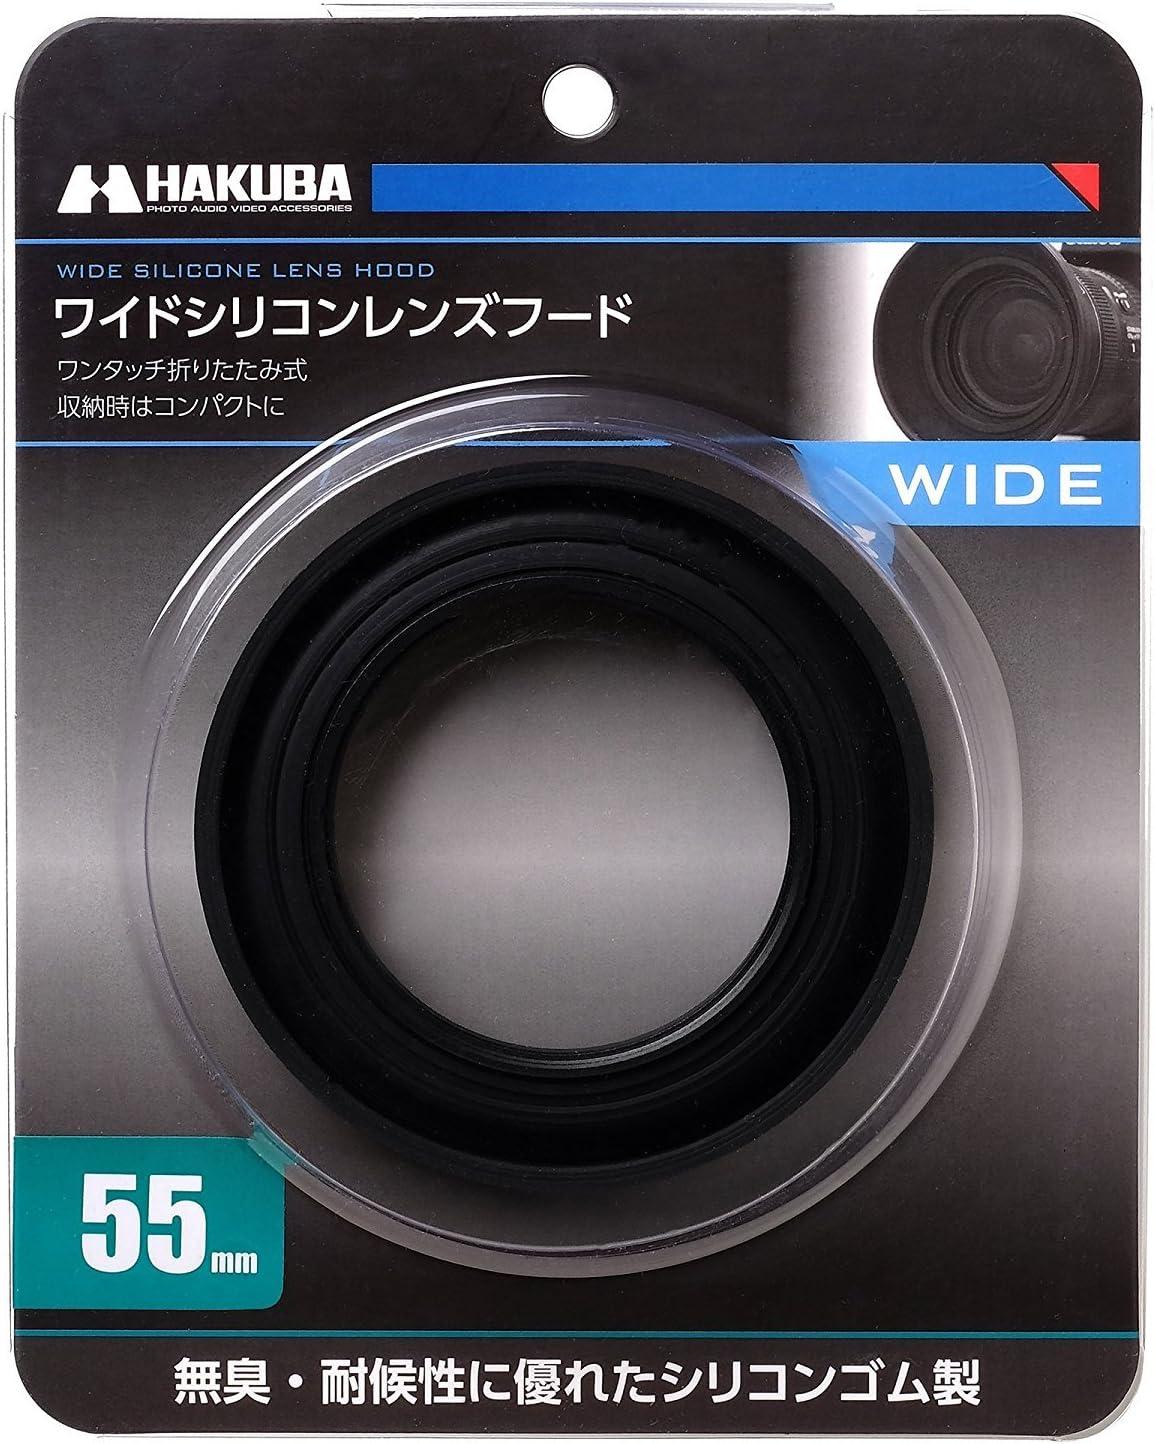 58mm HAKUBA Lens Hood Wide Silicon Lens Hood Folding Filter 径装 wear Black KA-WSLH58